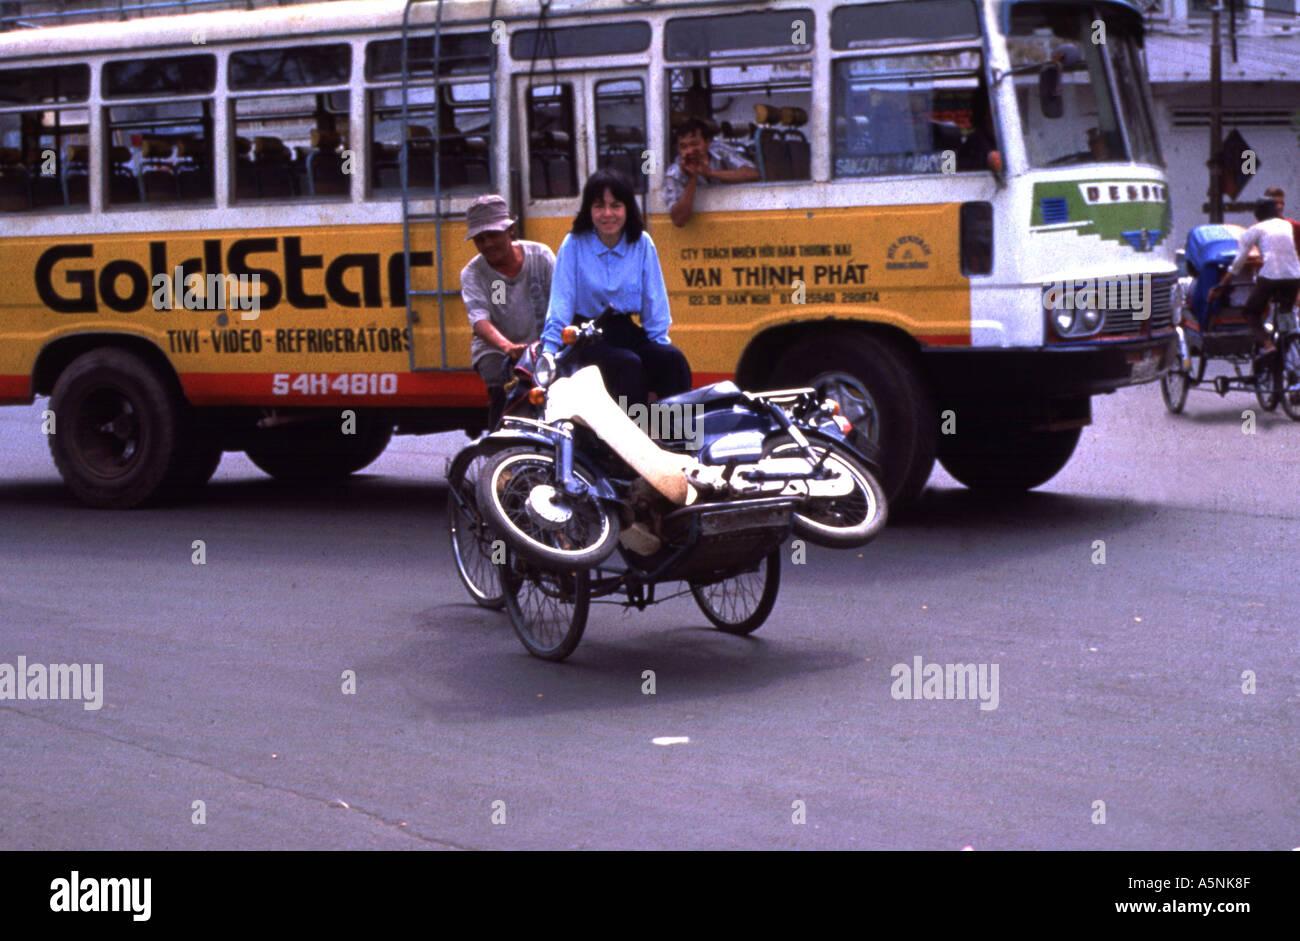 A CYCLO TRANSPORTS A MOTORCYCLE SAIGON VIETNAM - Stock Image